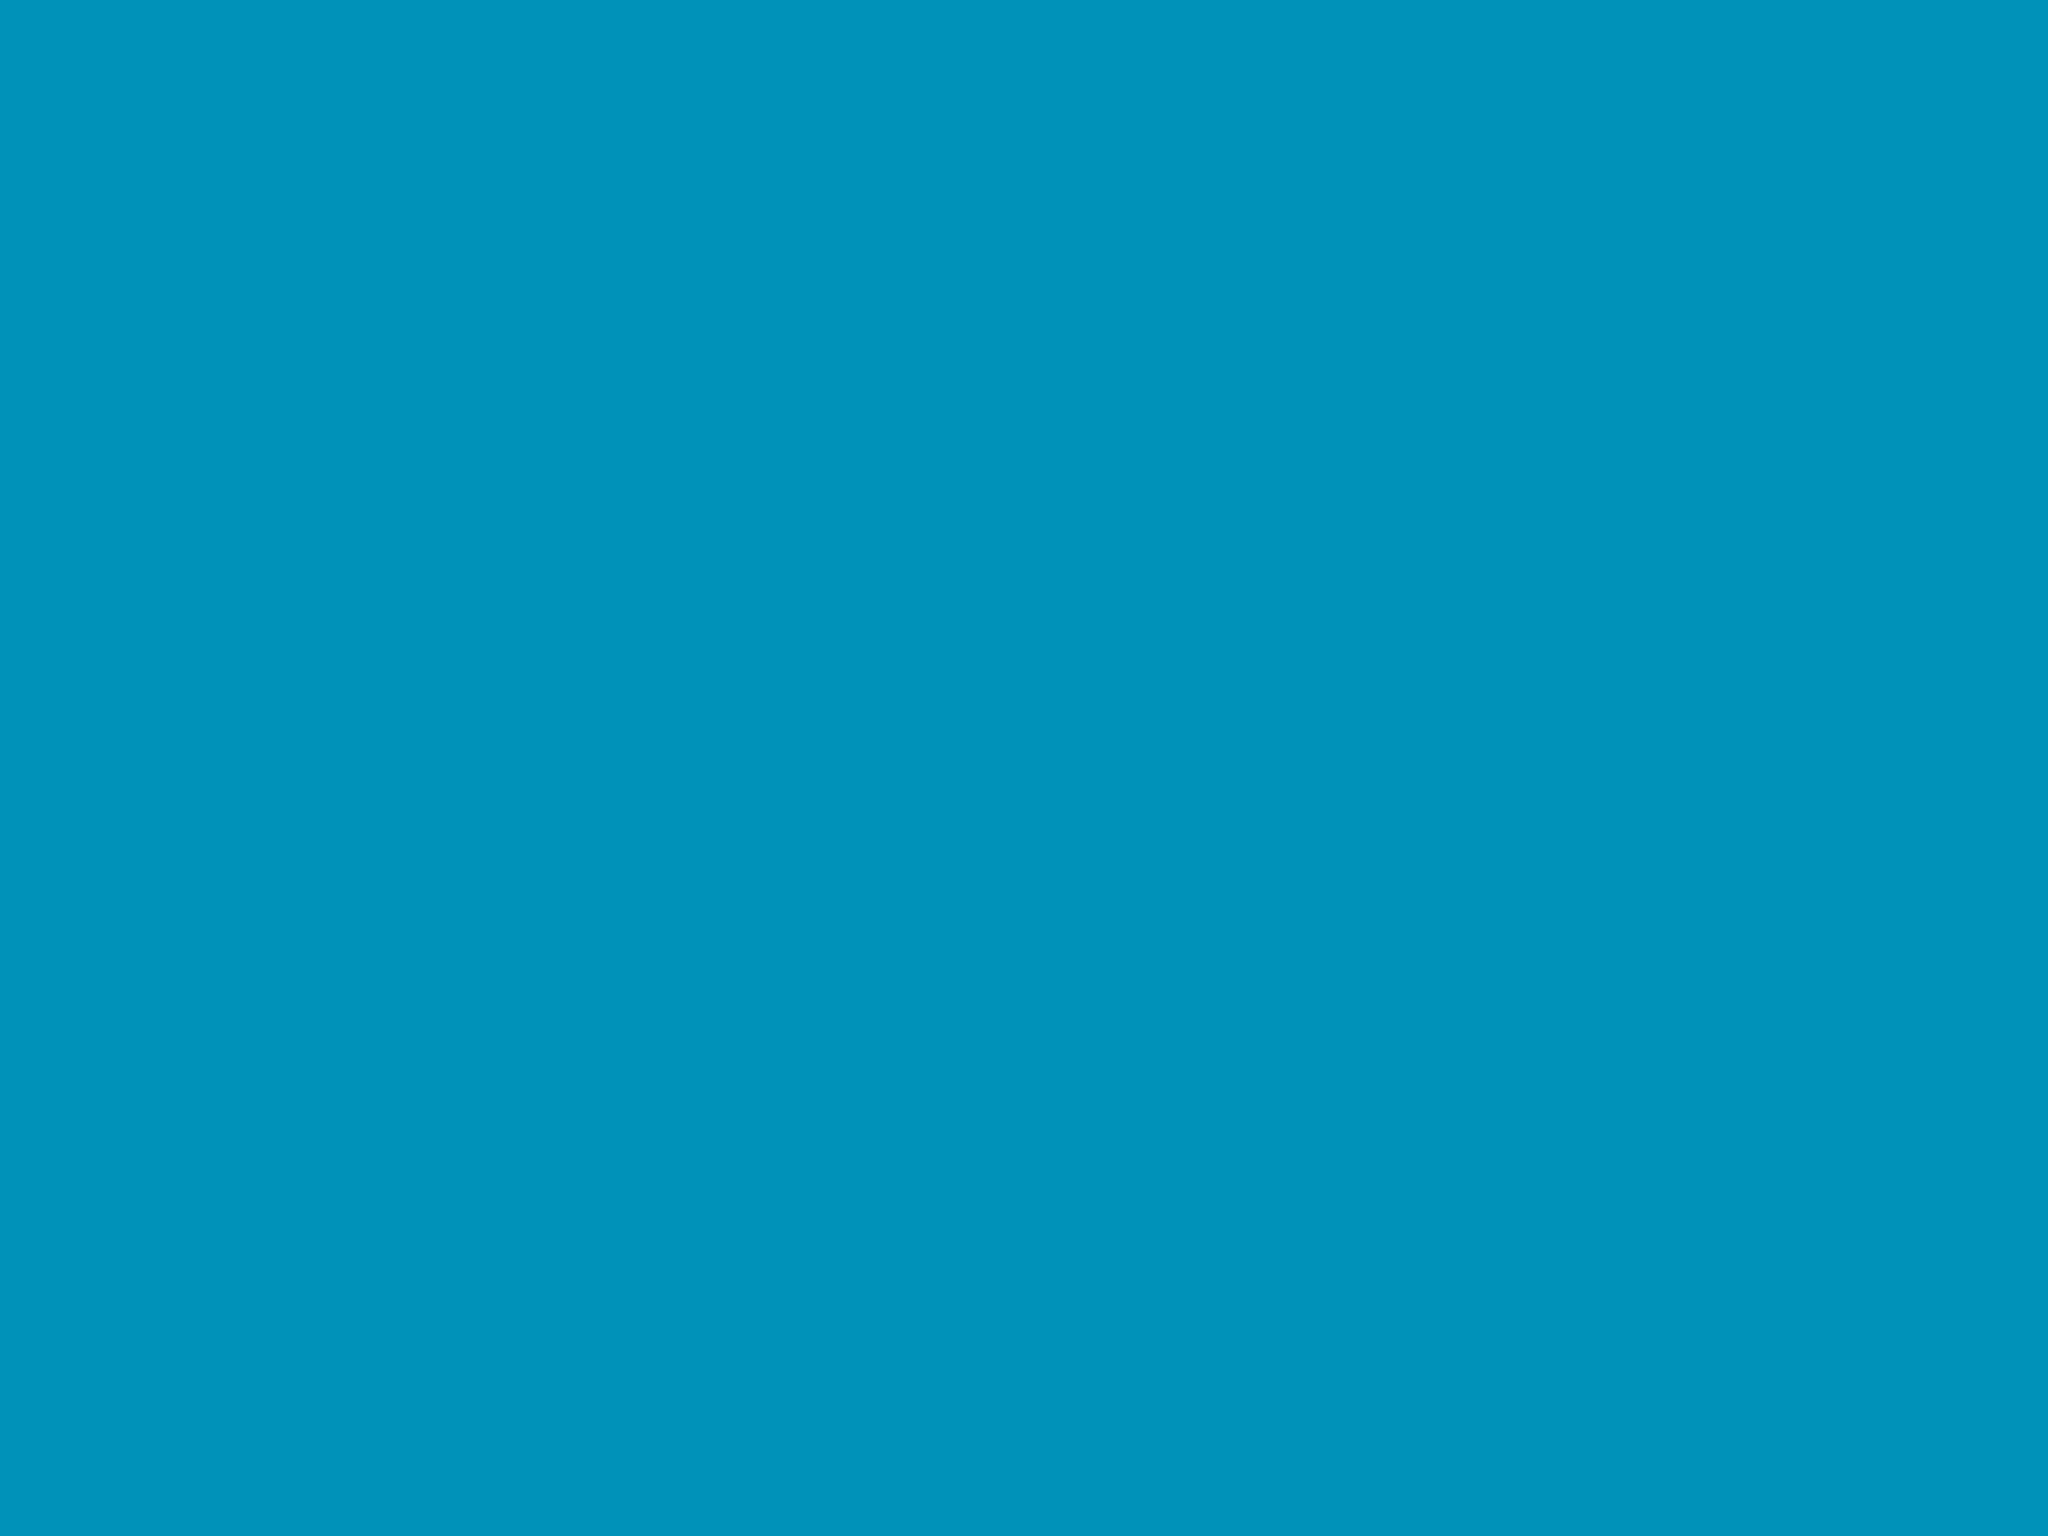 2048x1536 Bondi Blue Solid Color Background